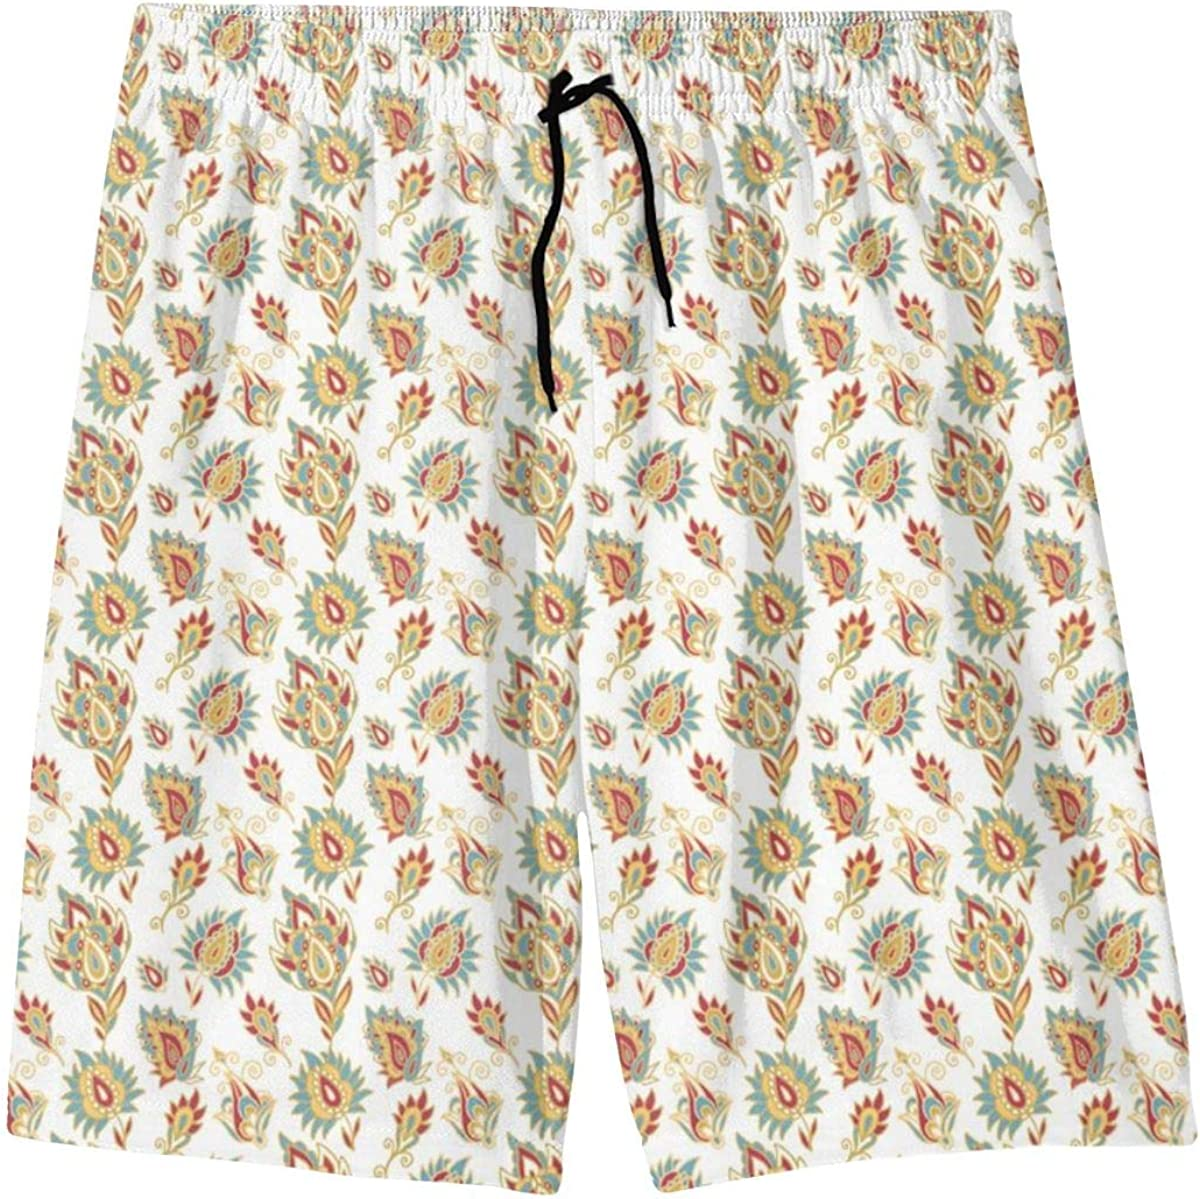 Homemen Boys Trunks Swimwear,Paisley/_1555